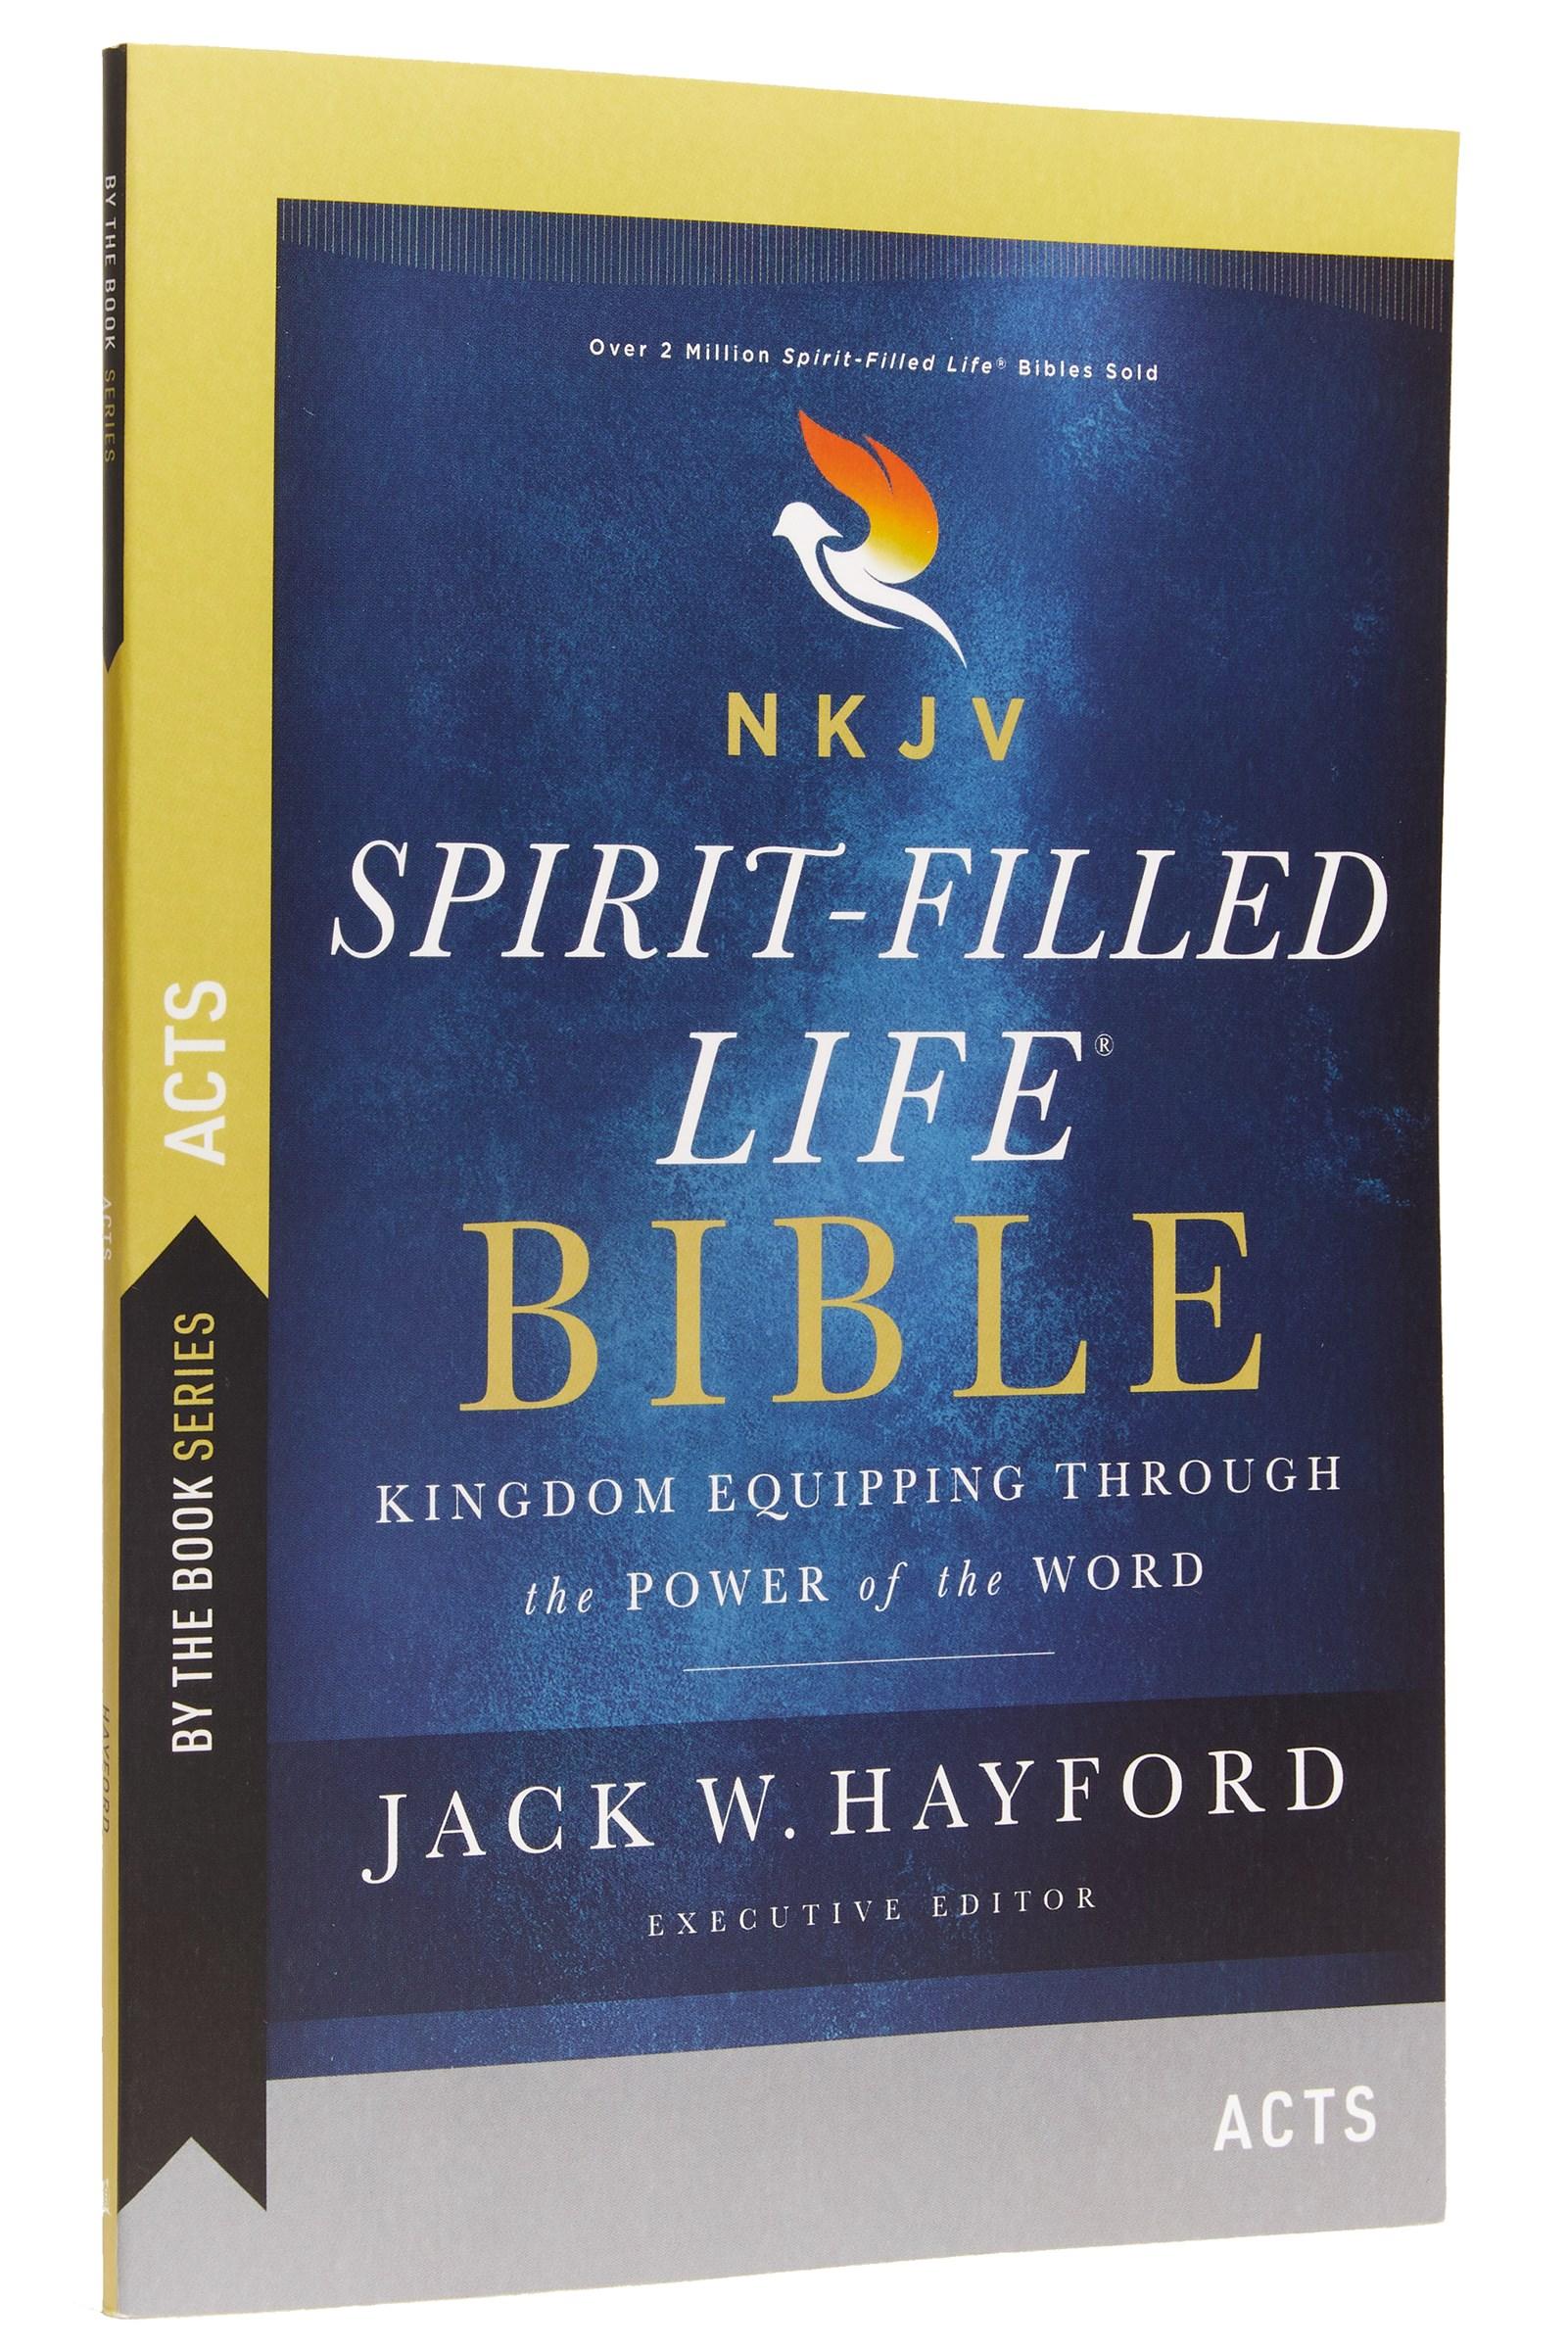 NKJV Spirit-Filled Life Bible: Acts (Comfort Print)-Softcover